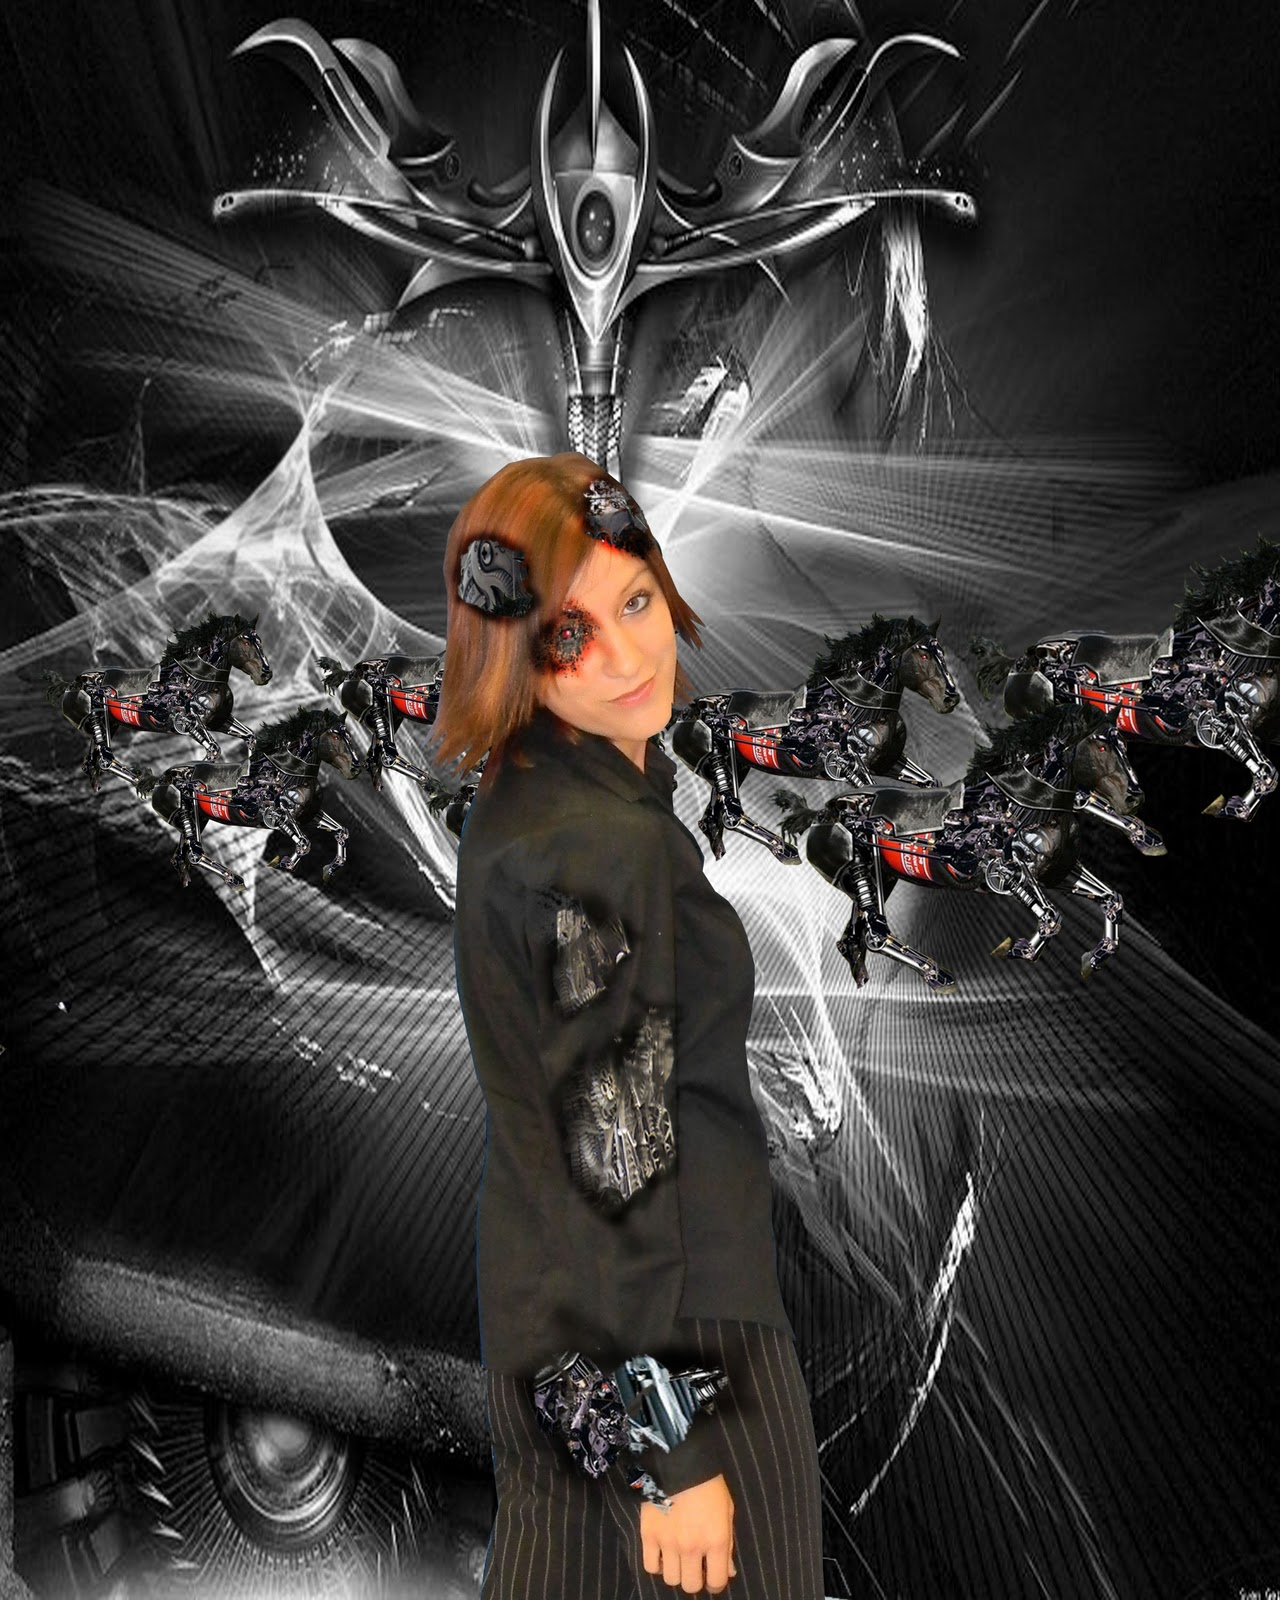 project cyborg Project cyborg.